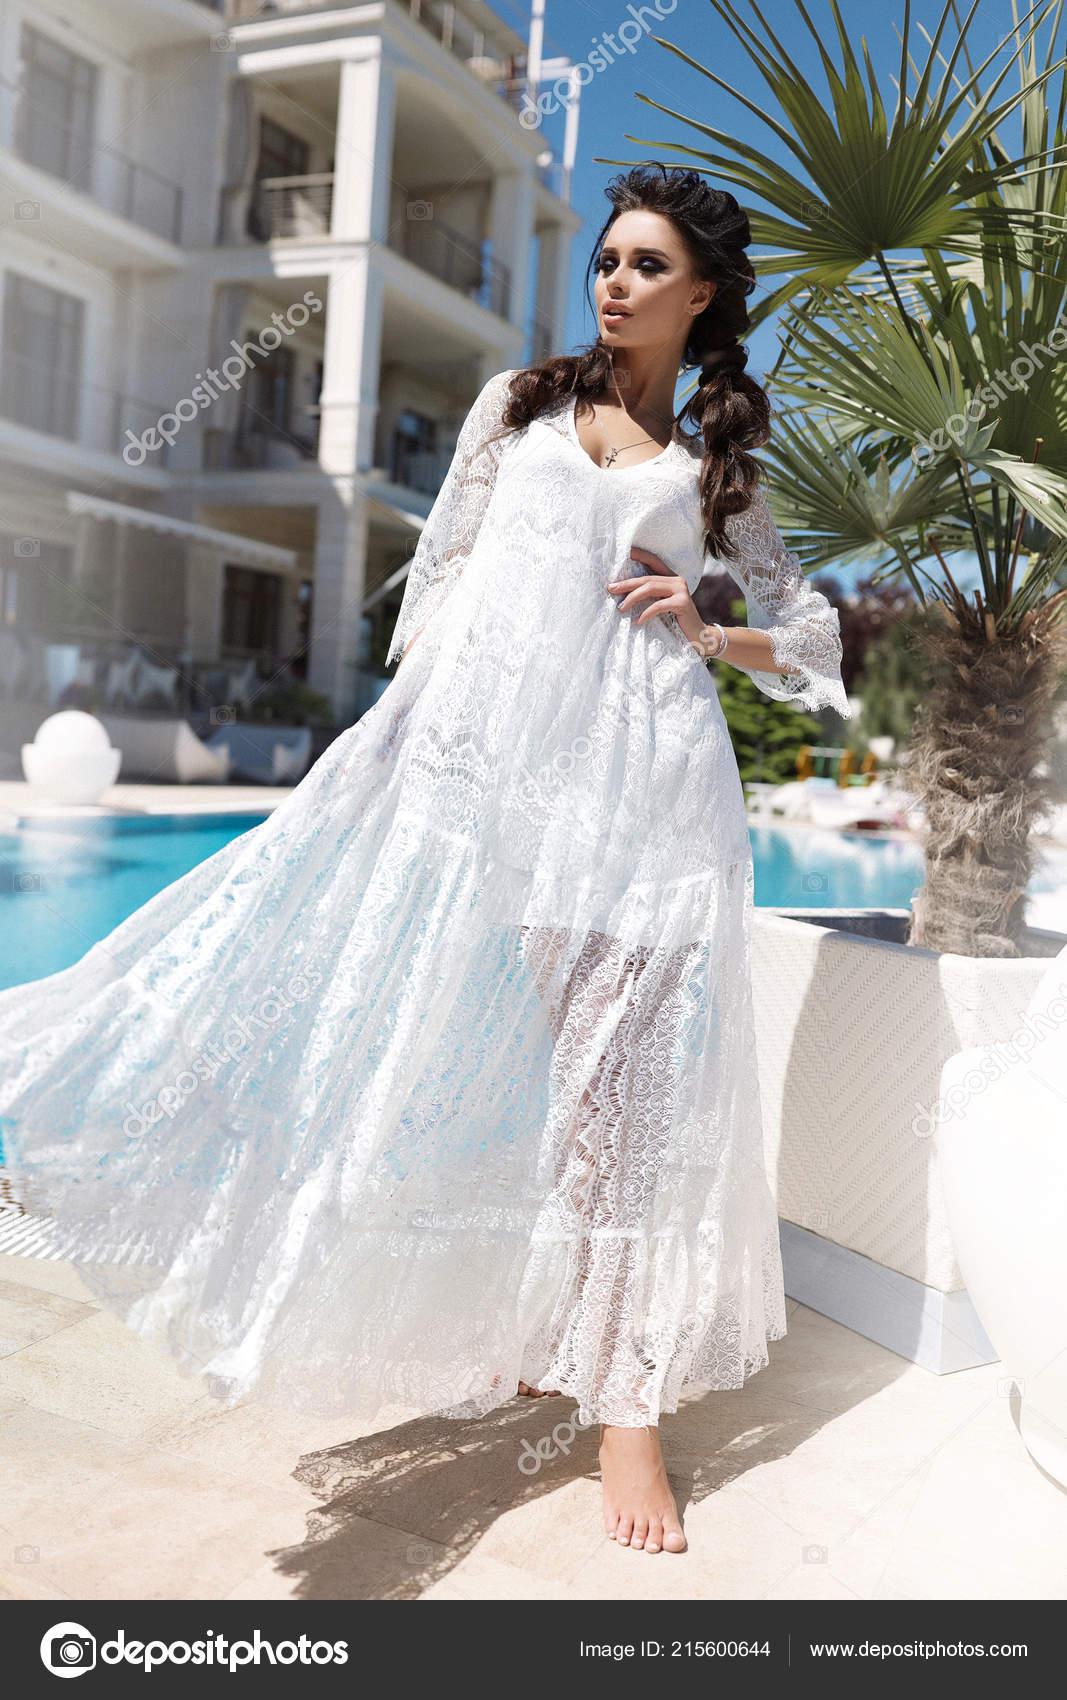 9b0e0323f81e Έκρυβαν Γυναίκα Στο Λευκό Φως Φόρεμα Καλοκαίρι Ζεστό Brades Στέκεται ...